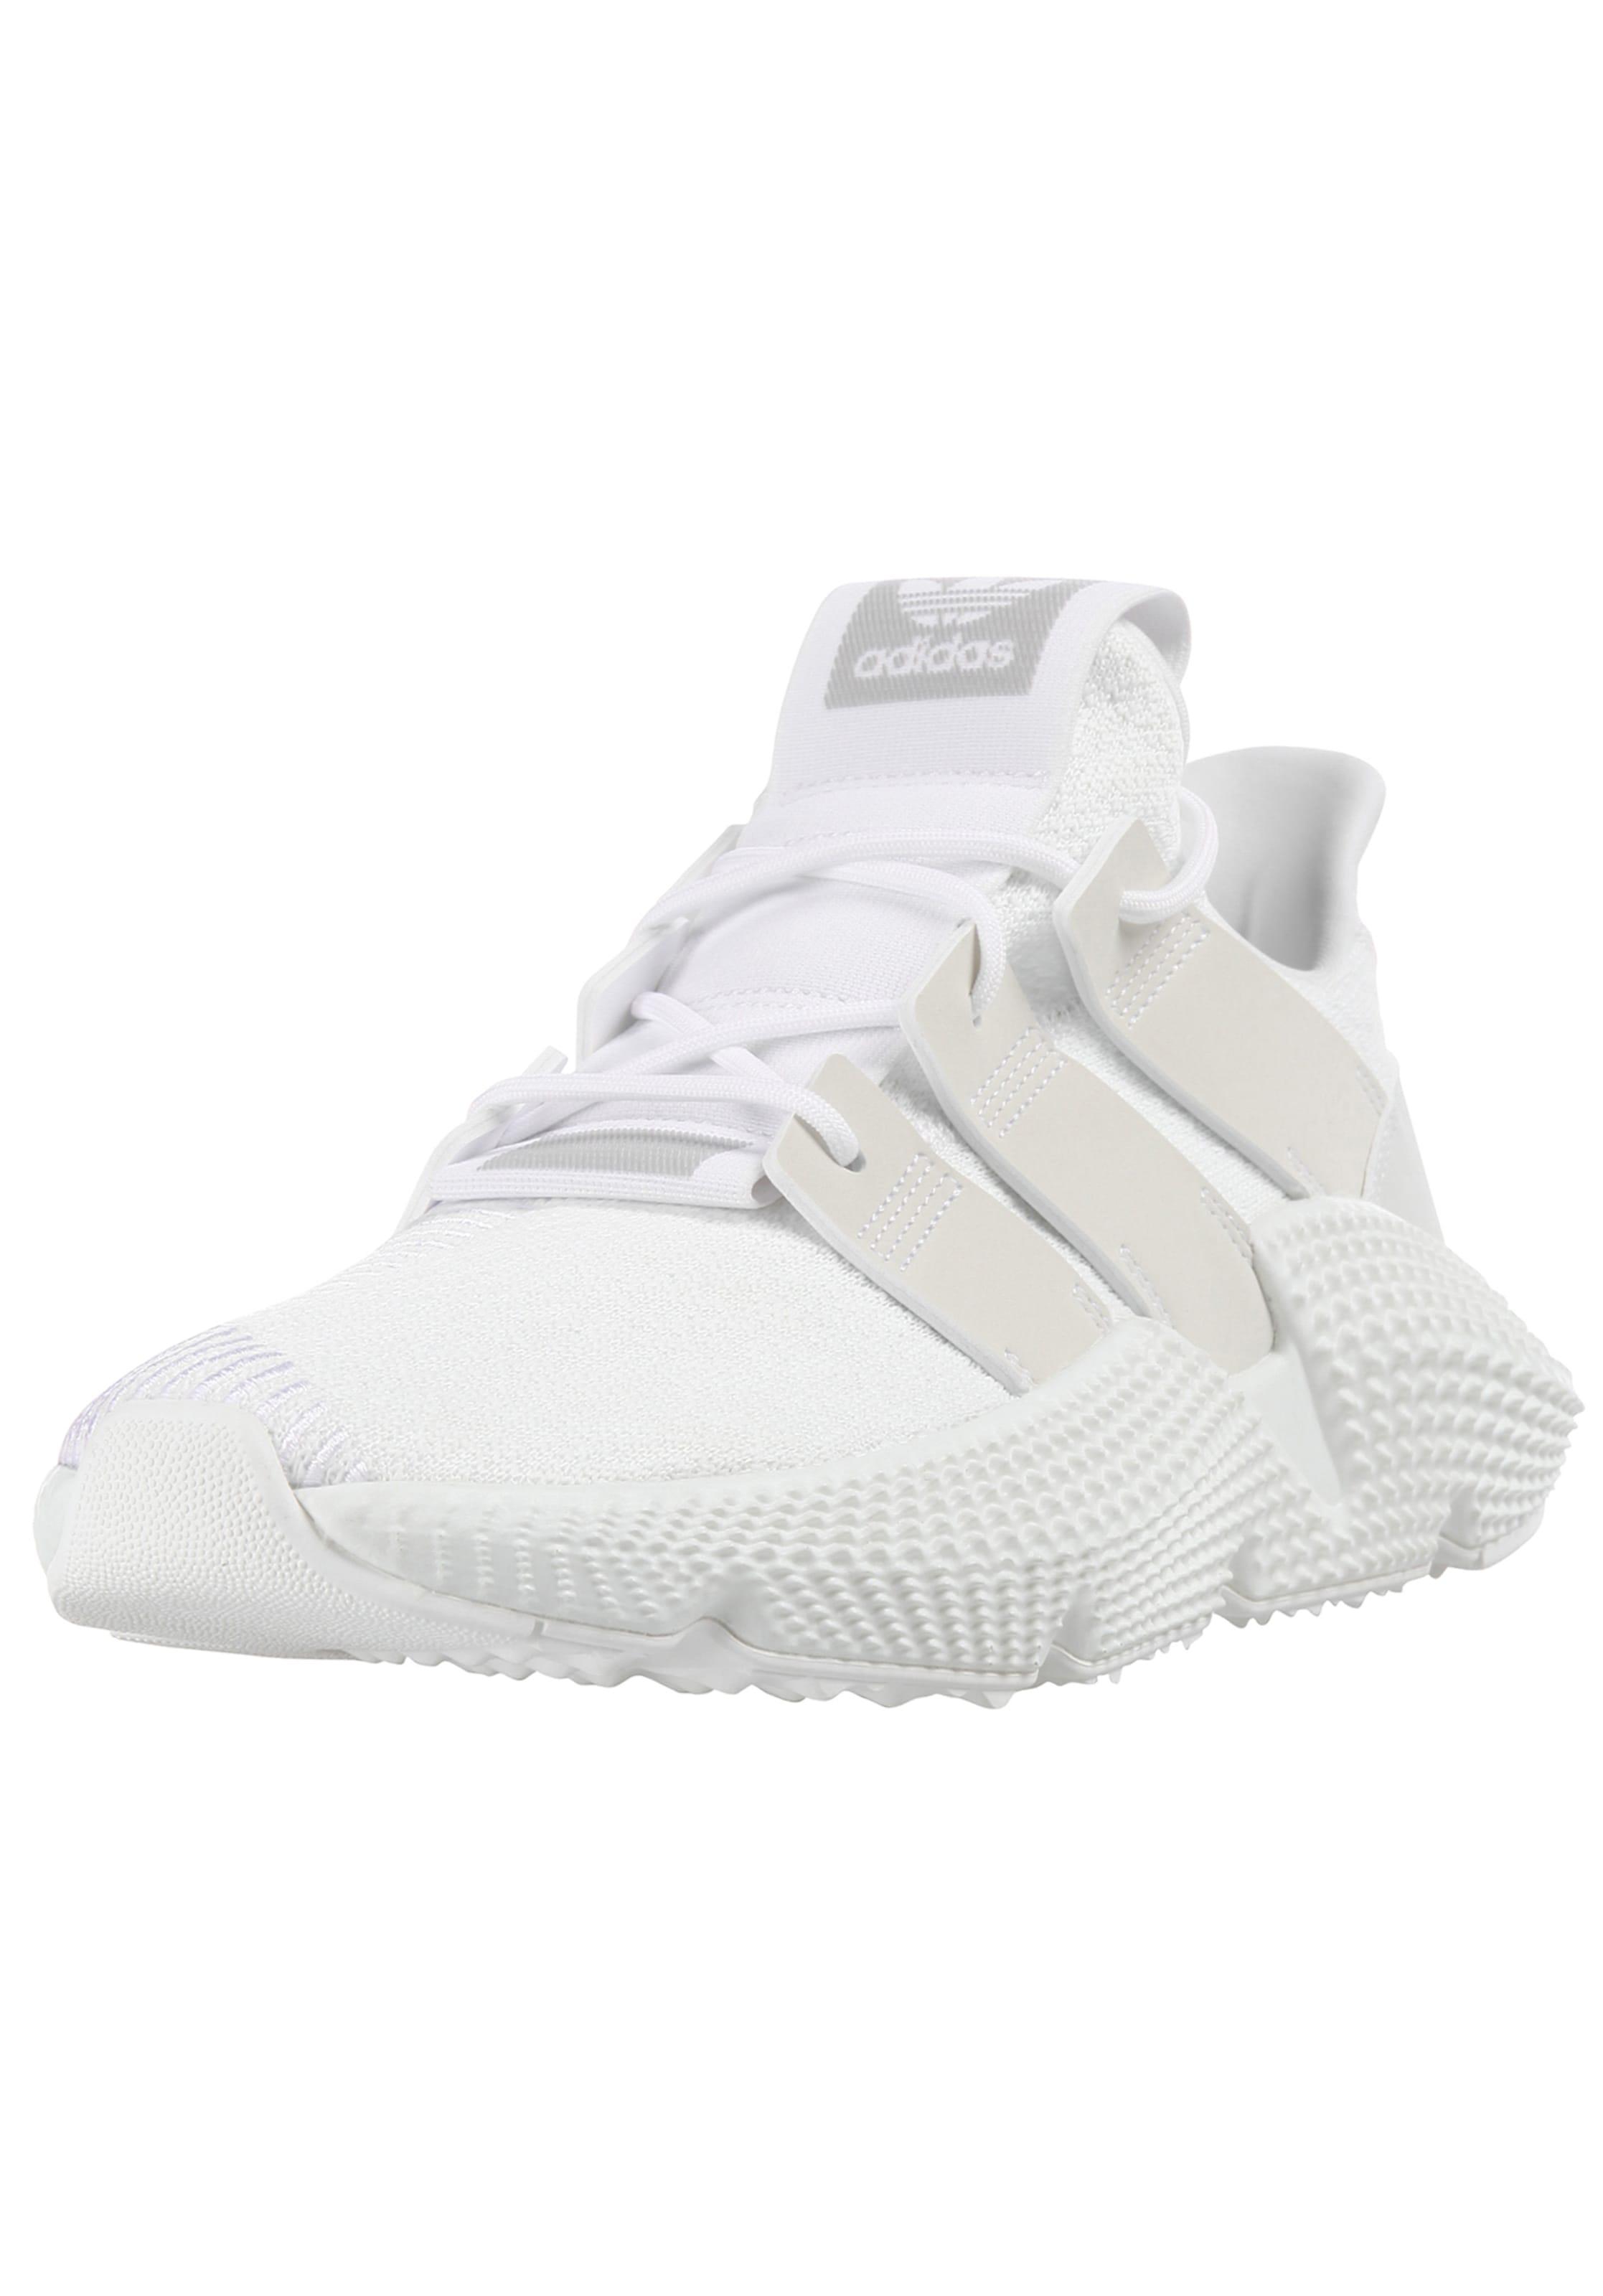 ADIDAS ADIDAS ADIDAS ORIGINALS | Prophere Sneaker 3c39cc